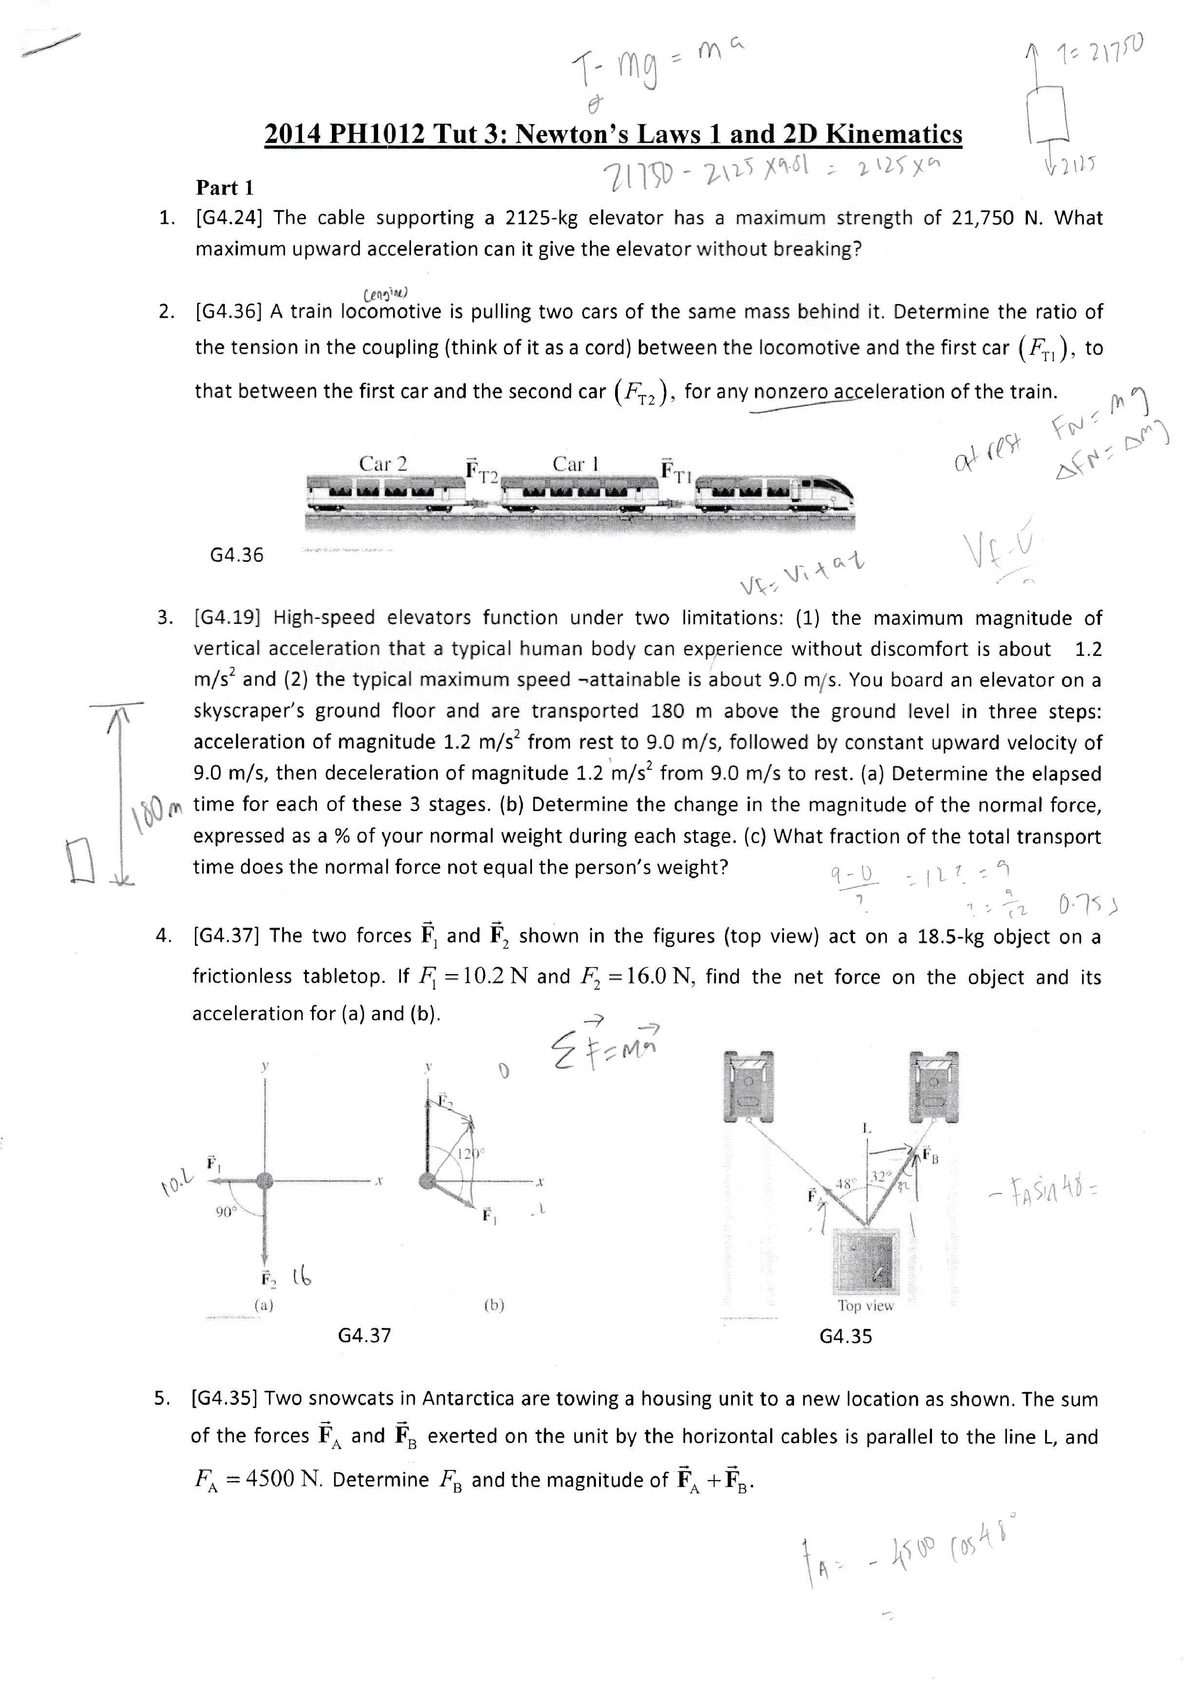 Physics A Tutorial 3 Solution - PH1012: Physics A - StuDocu